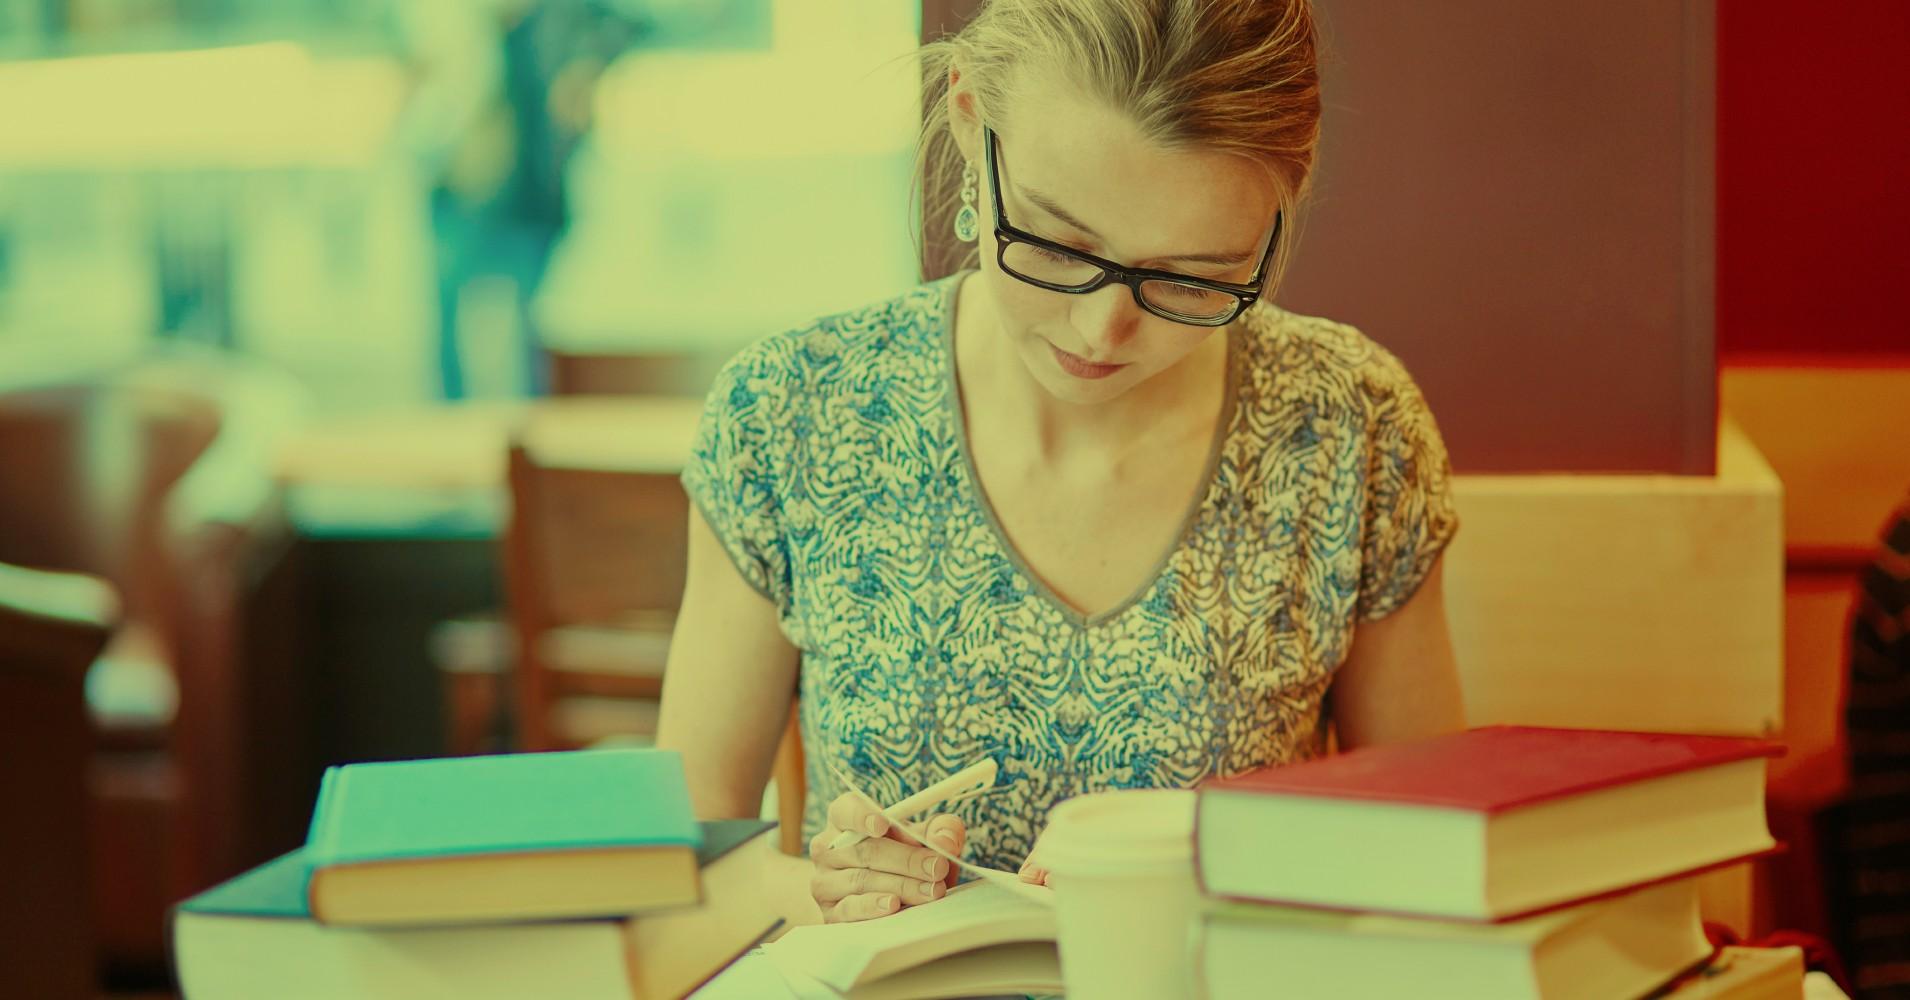 Rapariga a estudar concentrada